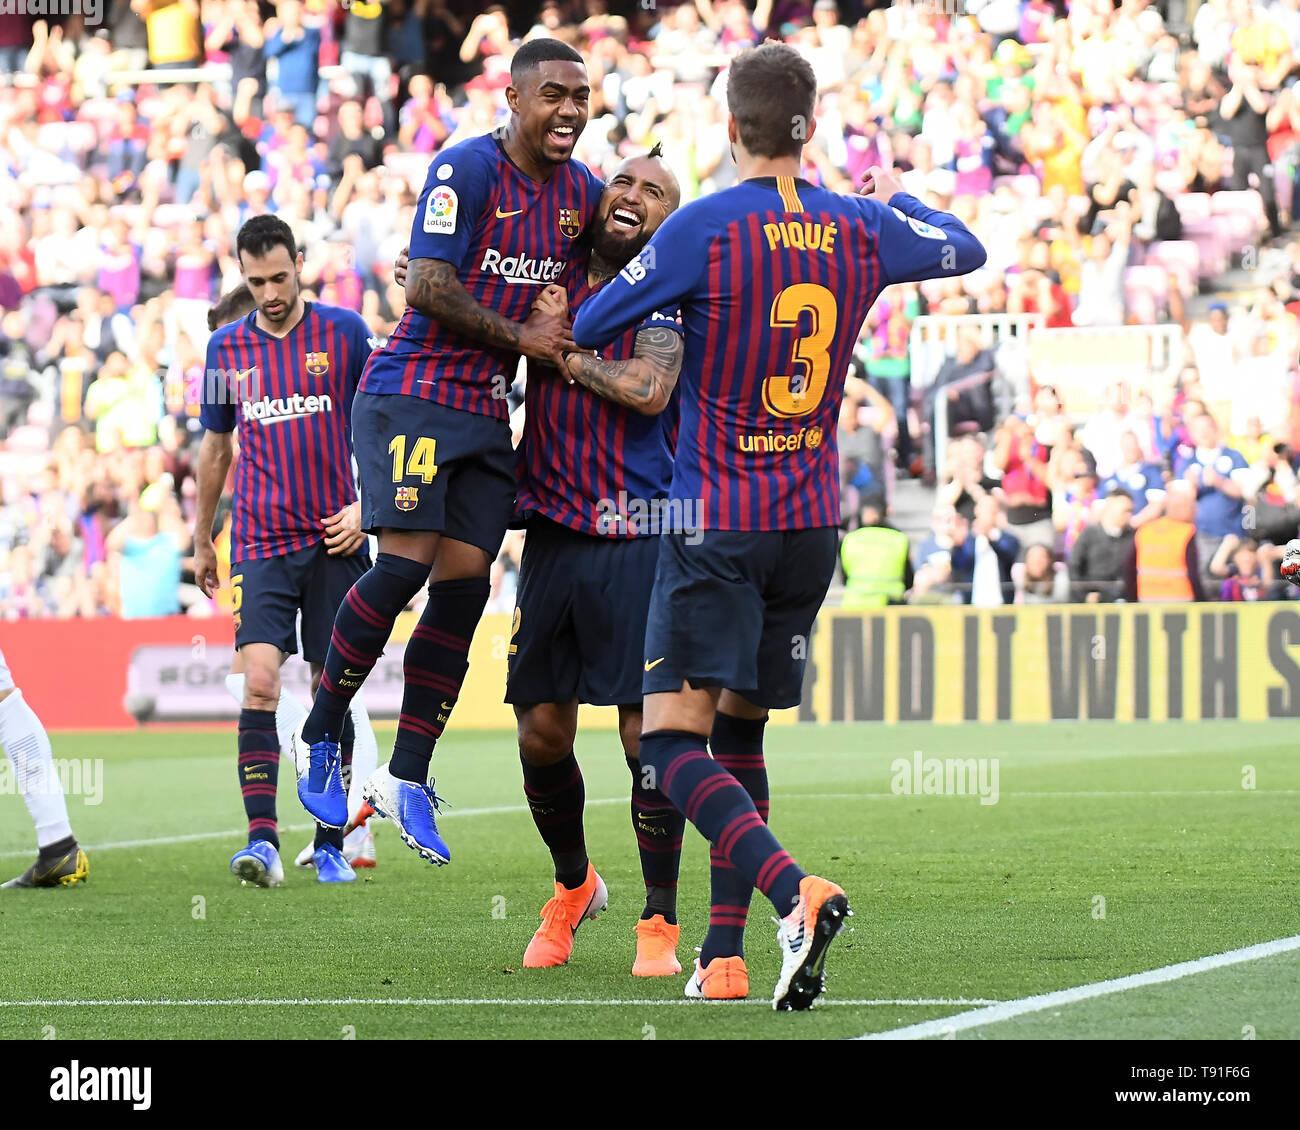 Arturo Vidal of FC Barcelona celebrates his goal with his teammates during the match between FC Barcelona vs Getafe CF of LaLiga, date 20, 2018-2019 season. Camp Nou Stadium. Barcelona, Spain - 12 may 2019 - Stock Image